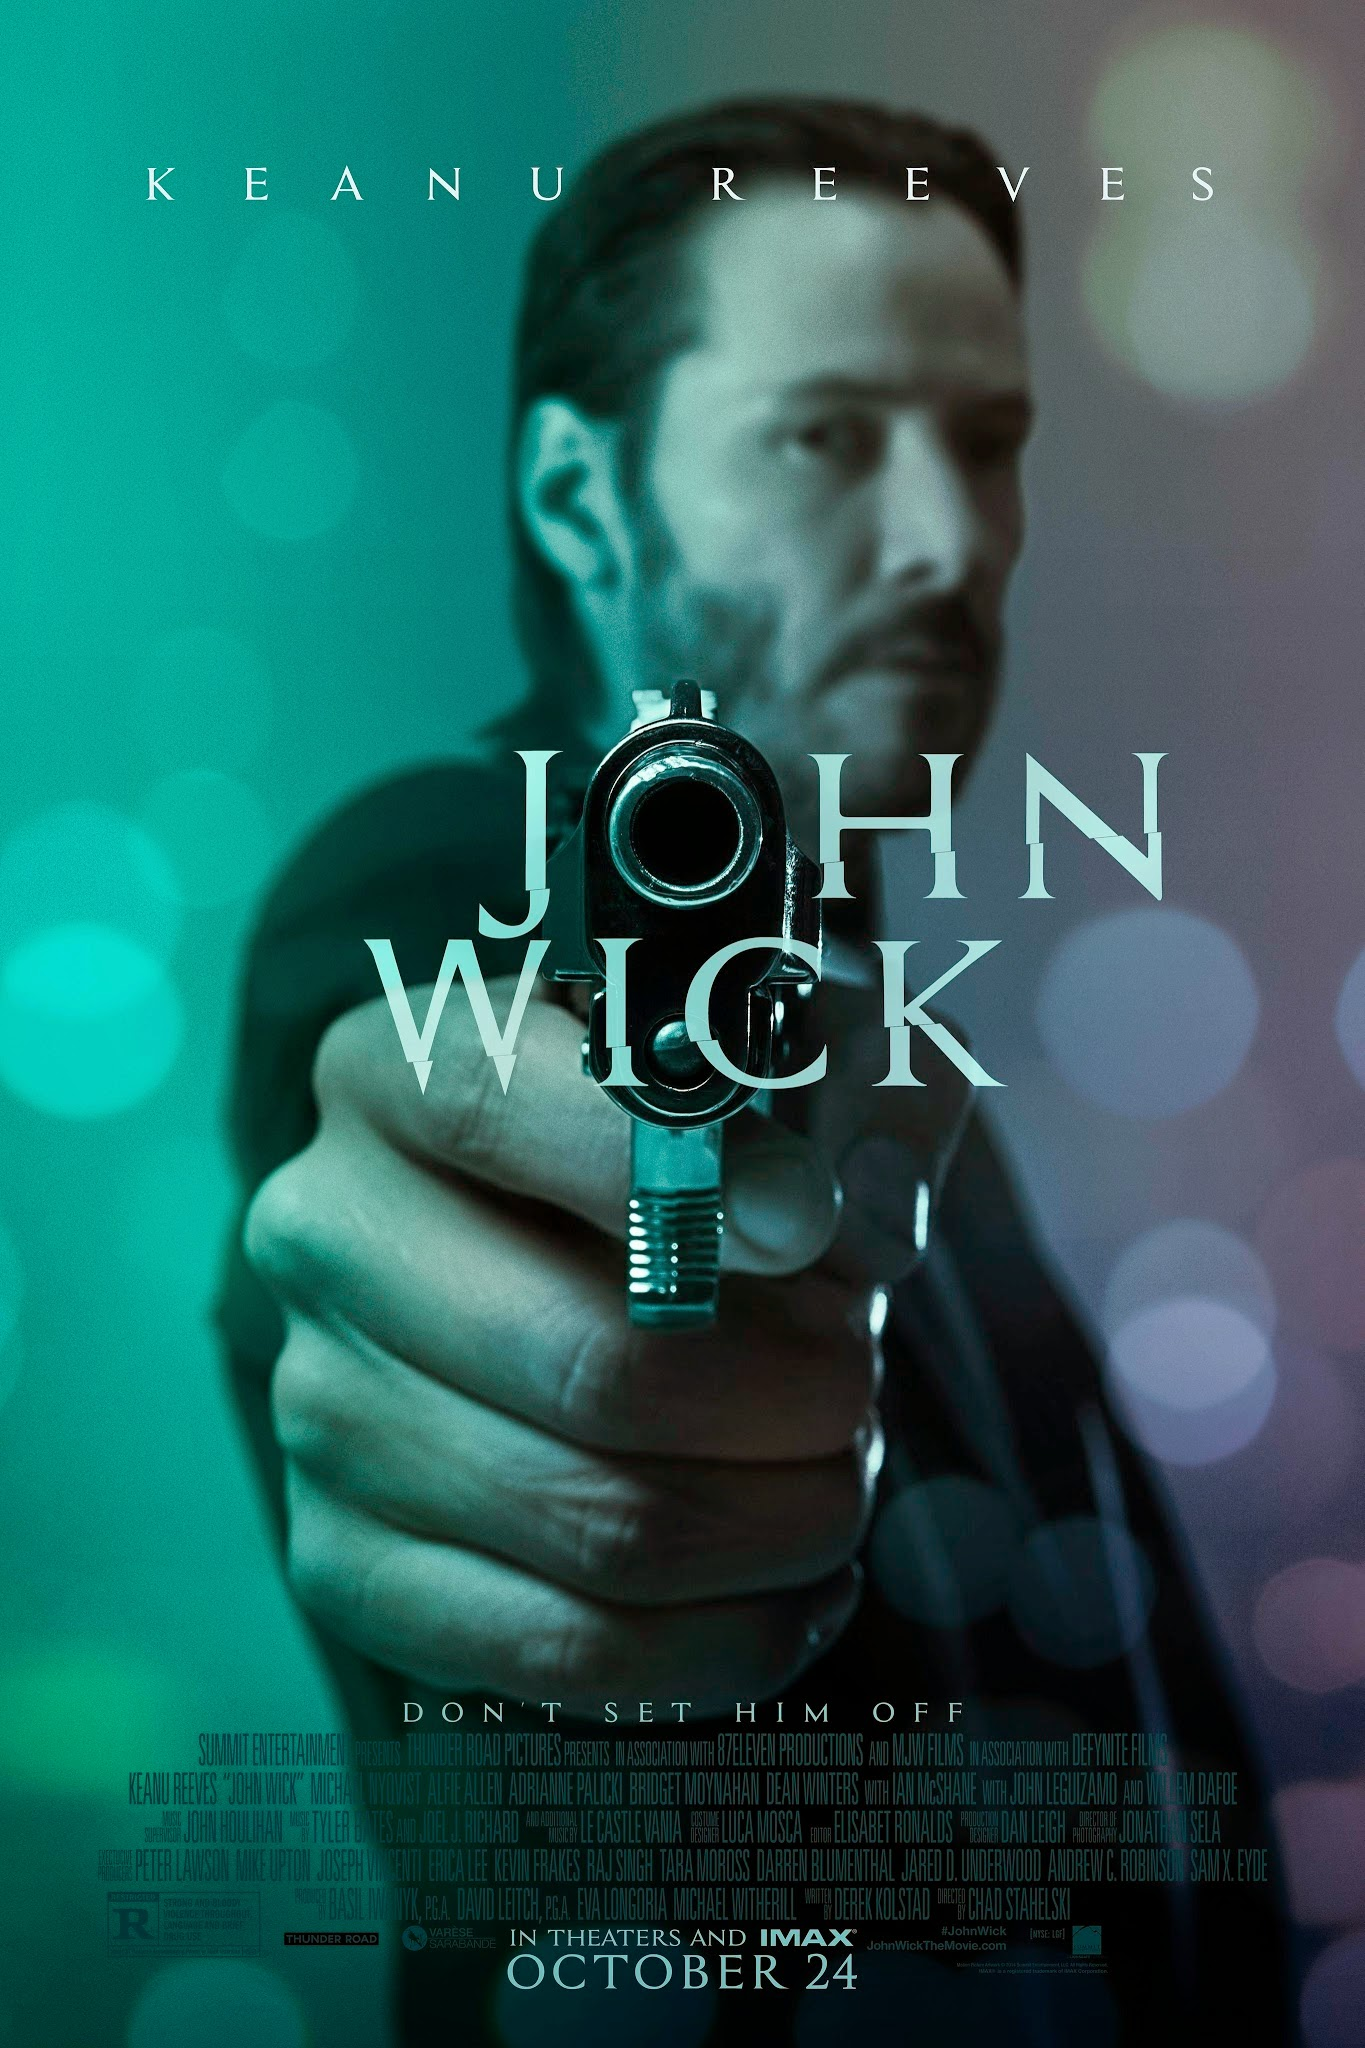 john wick recenzja filmu keanu reeves